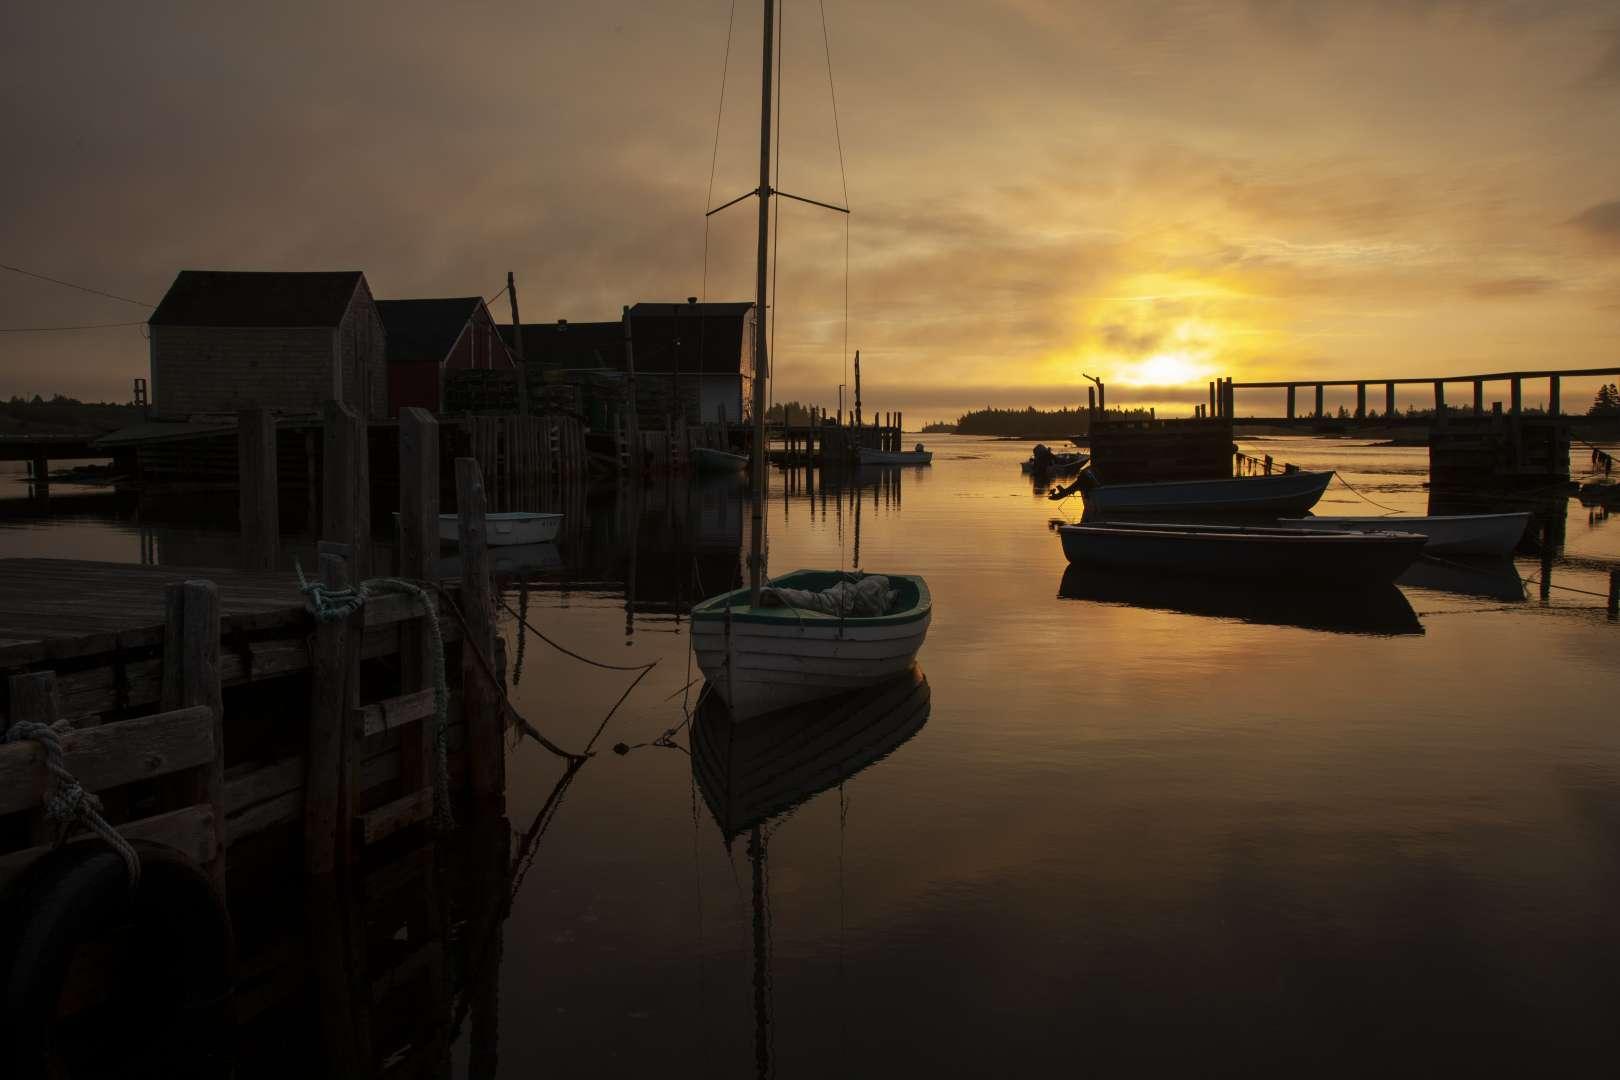 The Sun rises over the fishing village Blue Rocks, Lunenburg County, Nova Scotia.